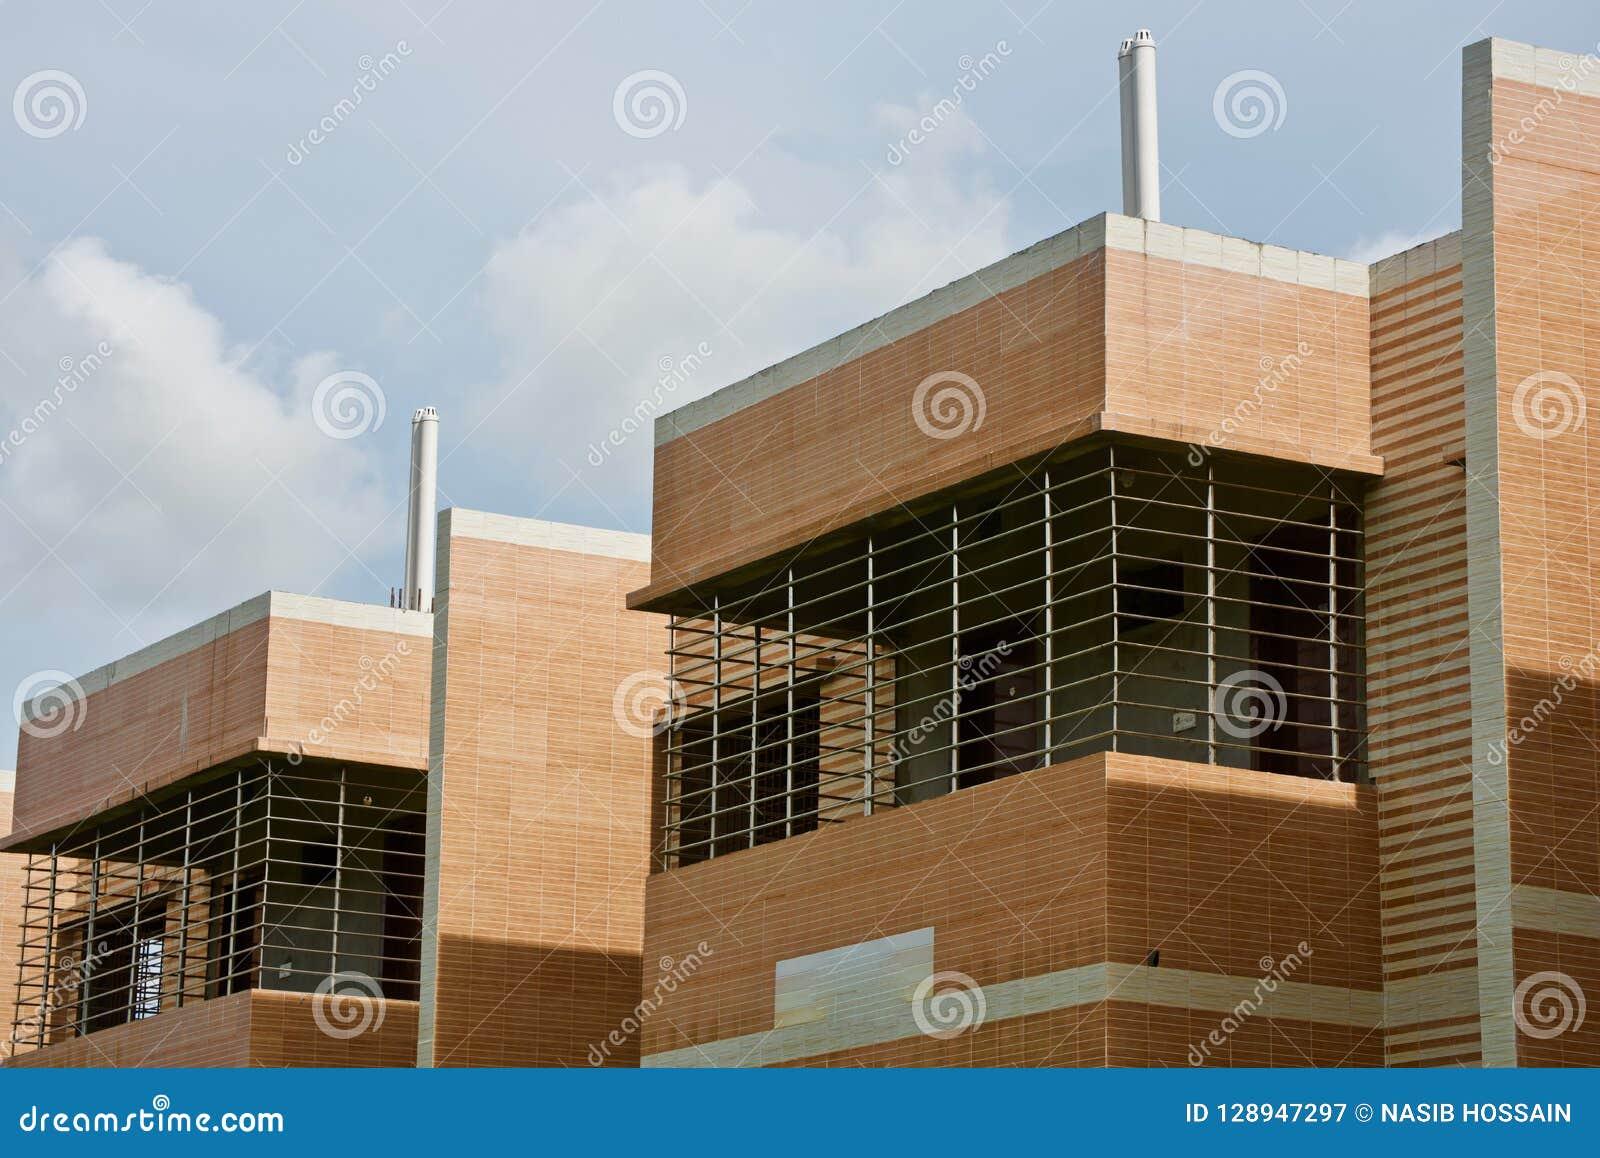 Modern architectural building unique photo